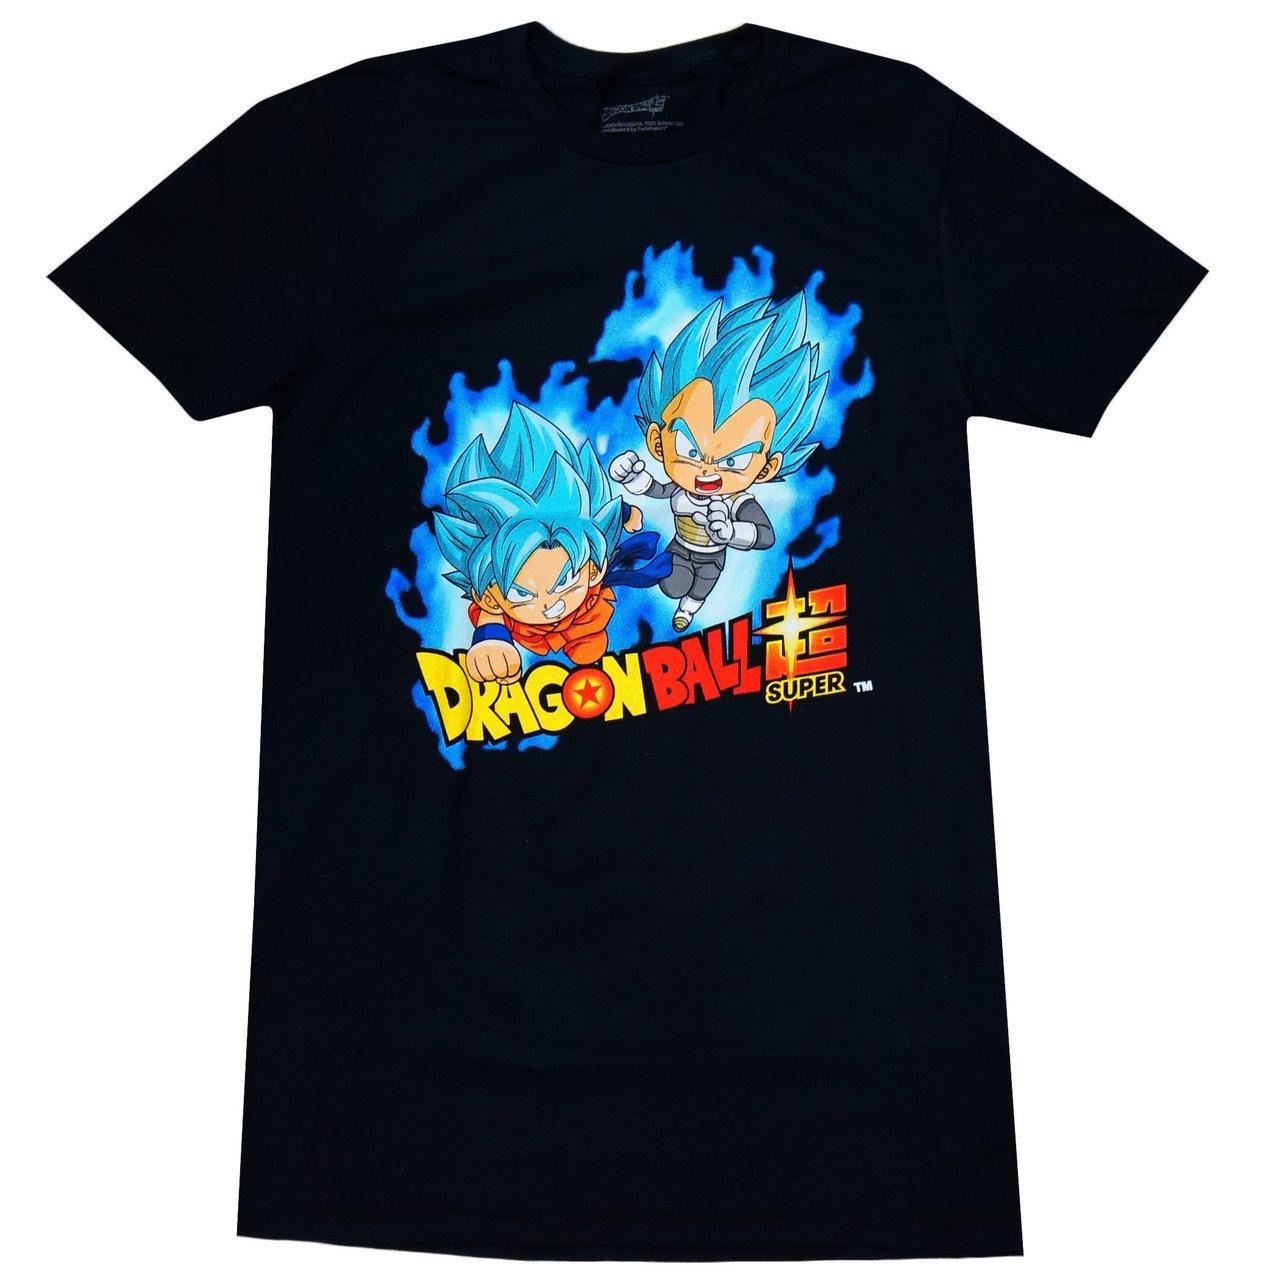 Dragon Ball Z Dragon Ball Super Sd Ssgss Super Saiyan Blue Goku Vegeta T Shirt 7338